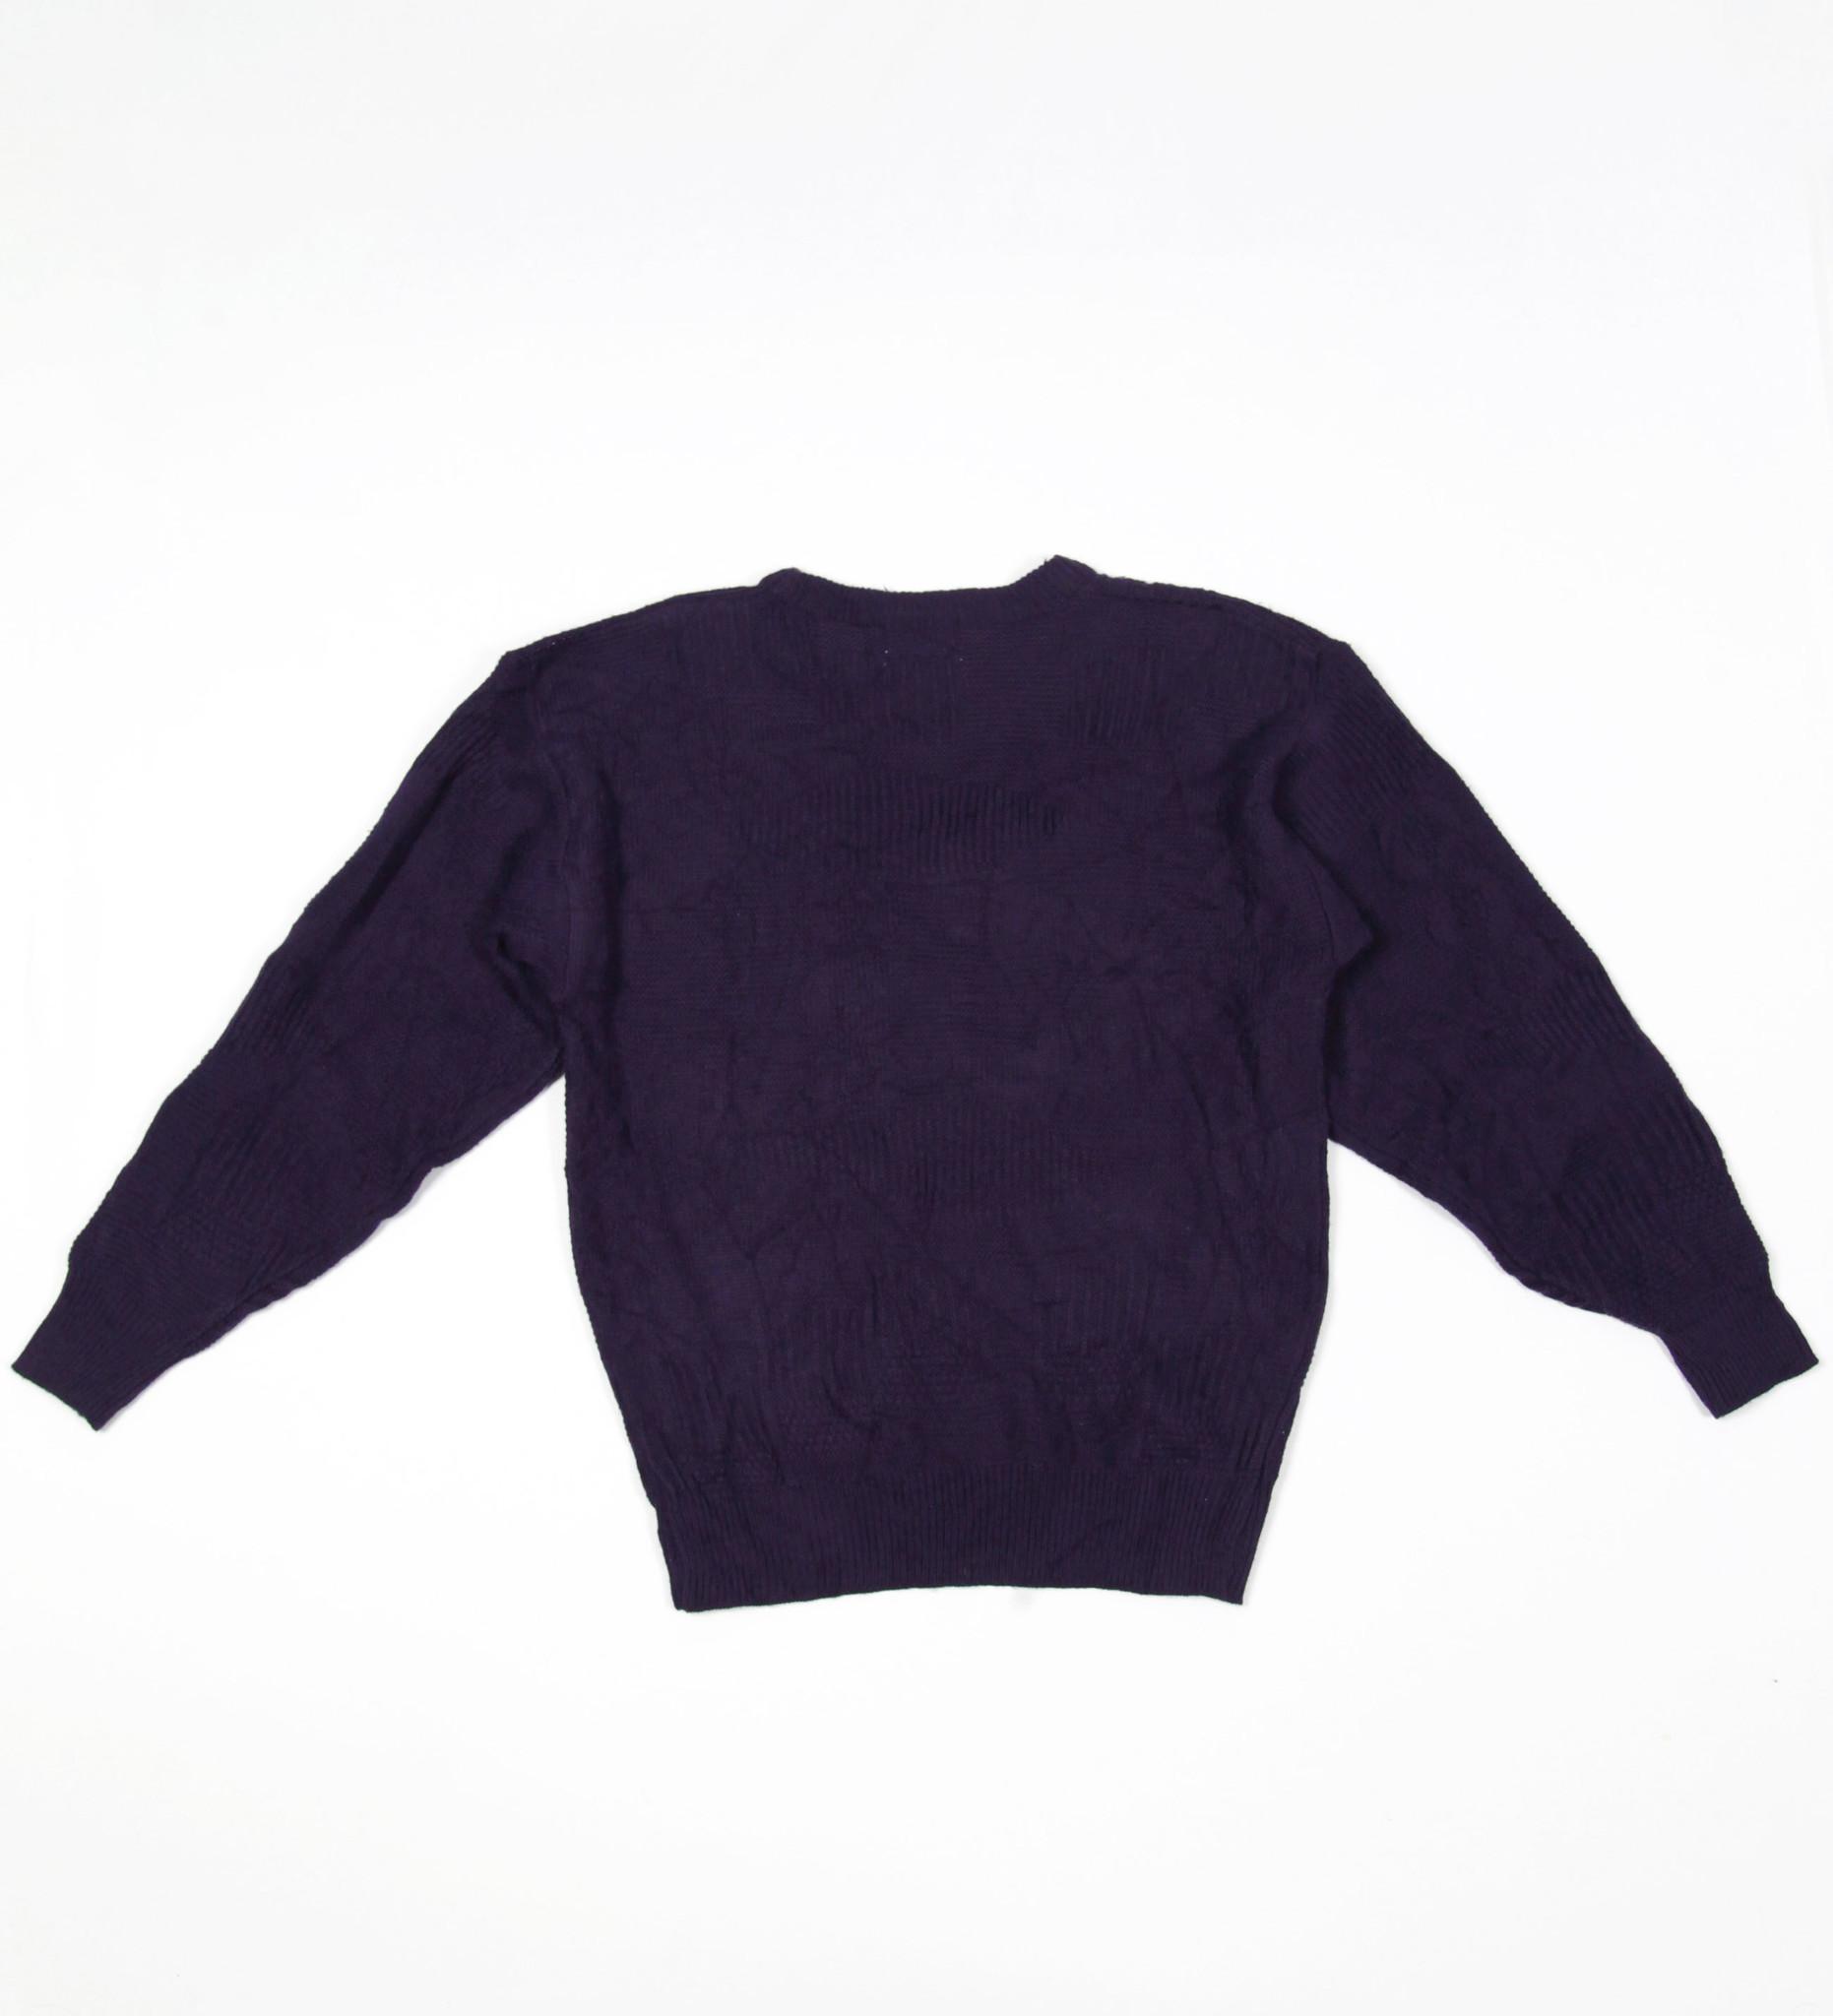 Purple cable jumper